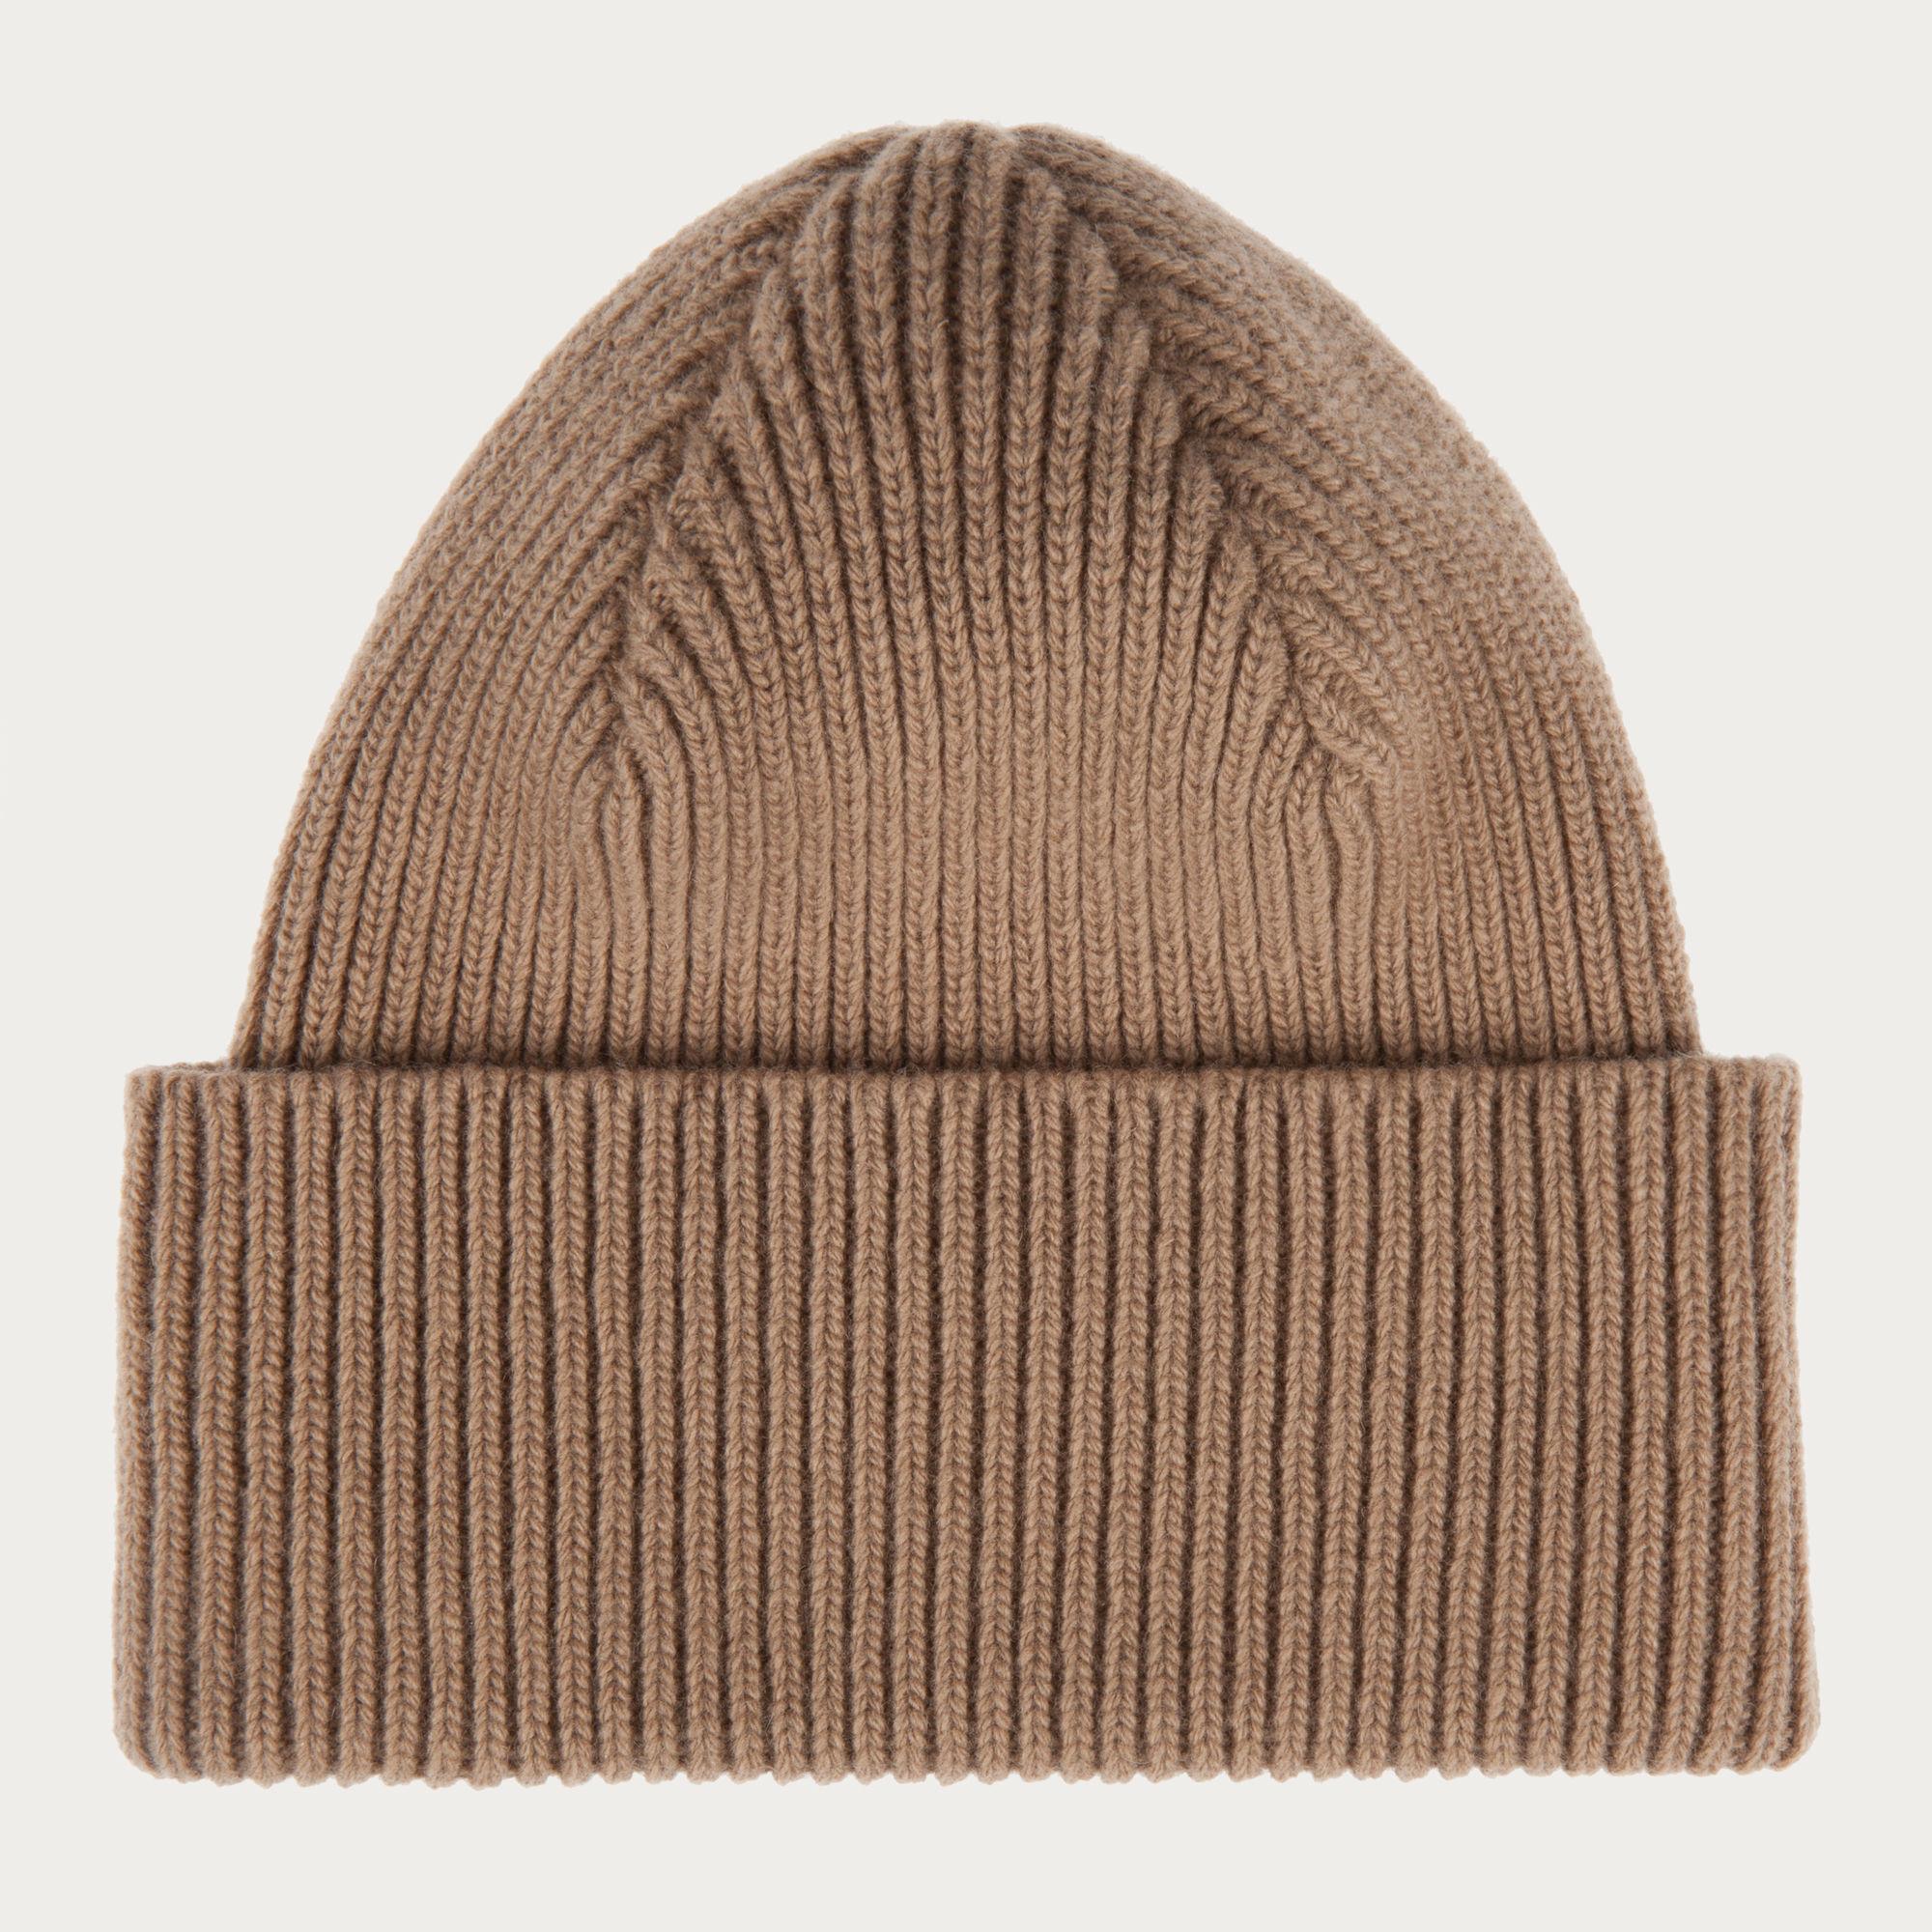 Knotted Beanie Hat White, Womens wool knit beanie hat in bone Bally